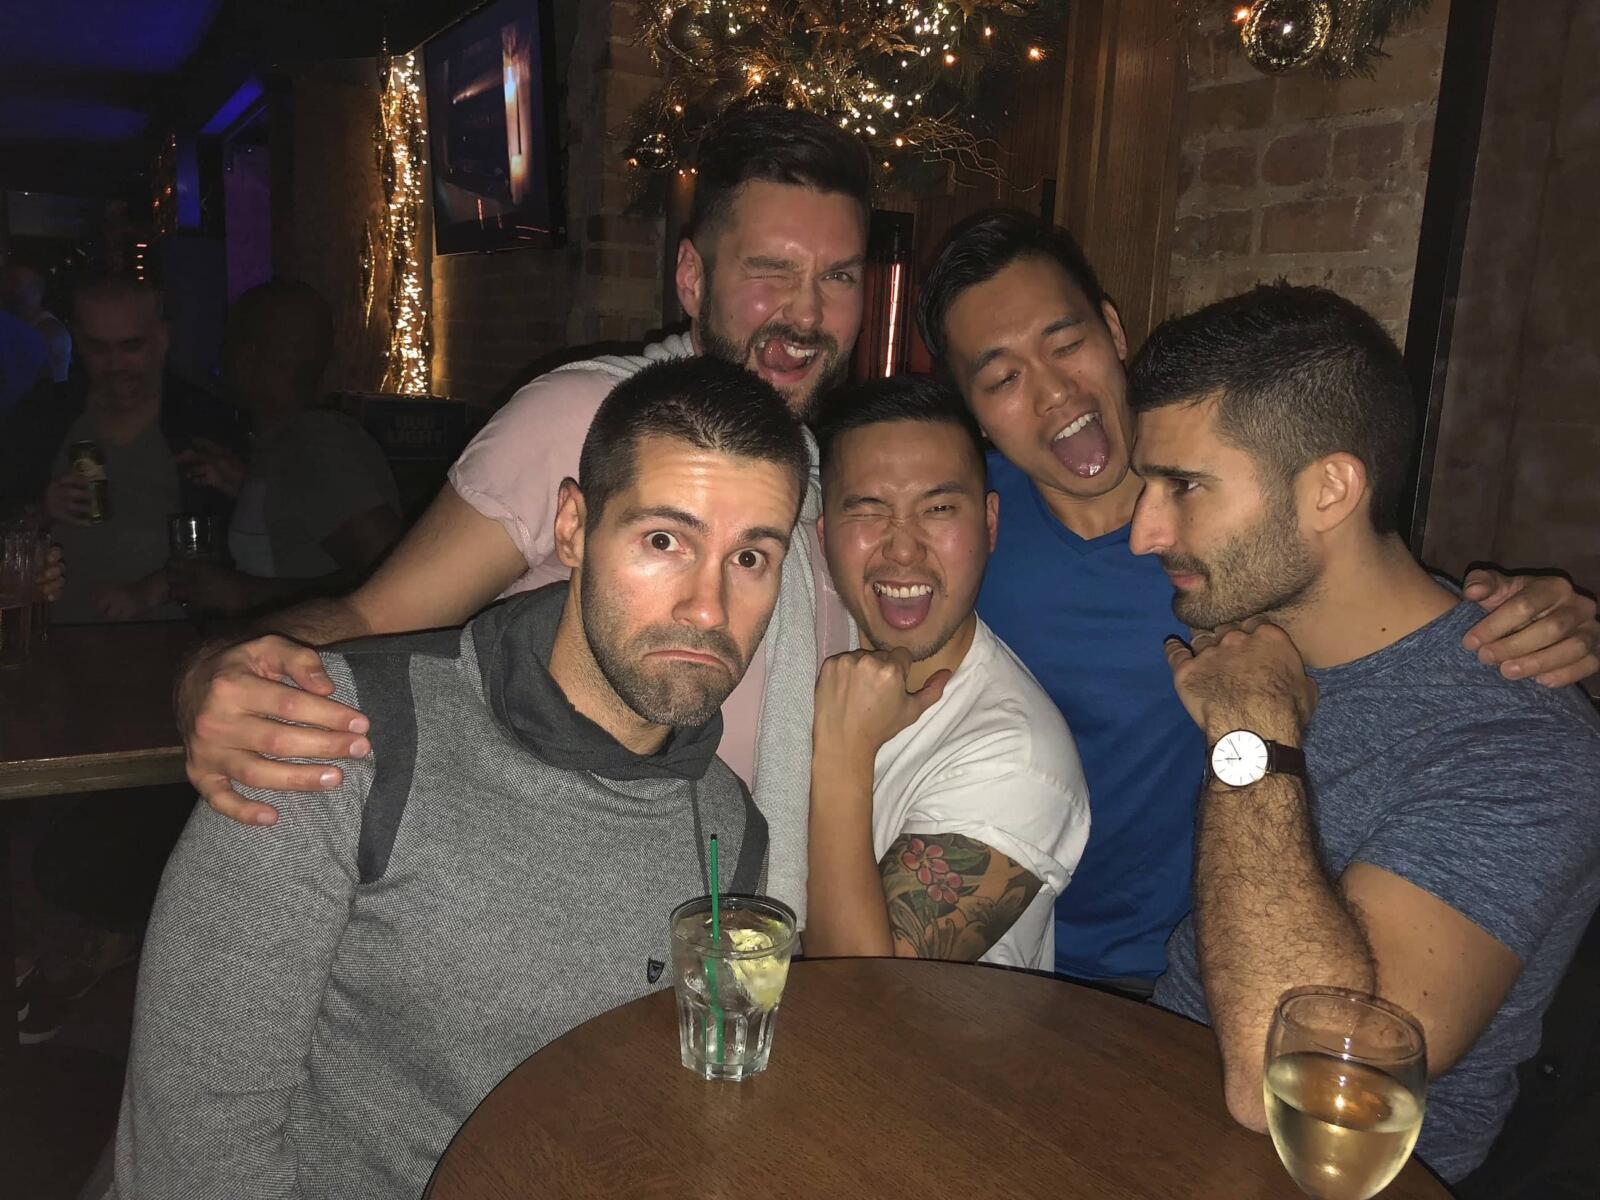 Gay Canada Toronto gay scene Woodys gay bar